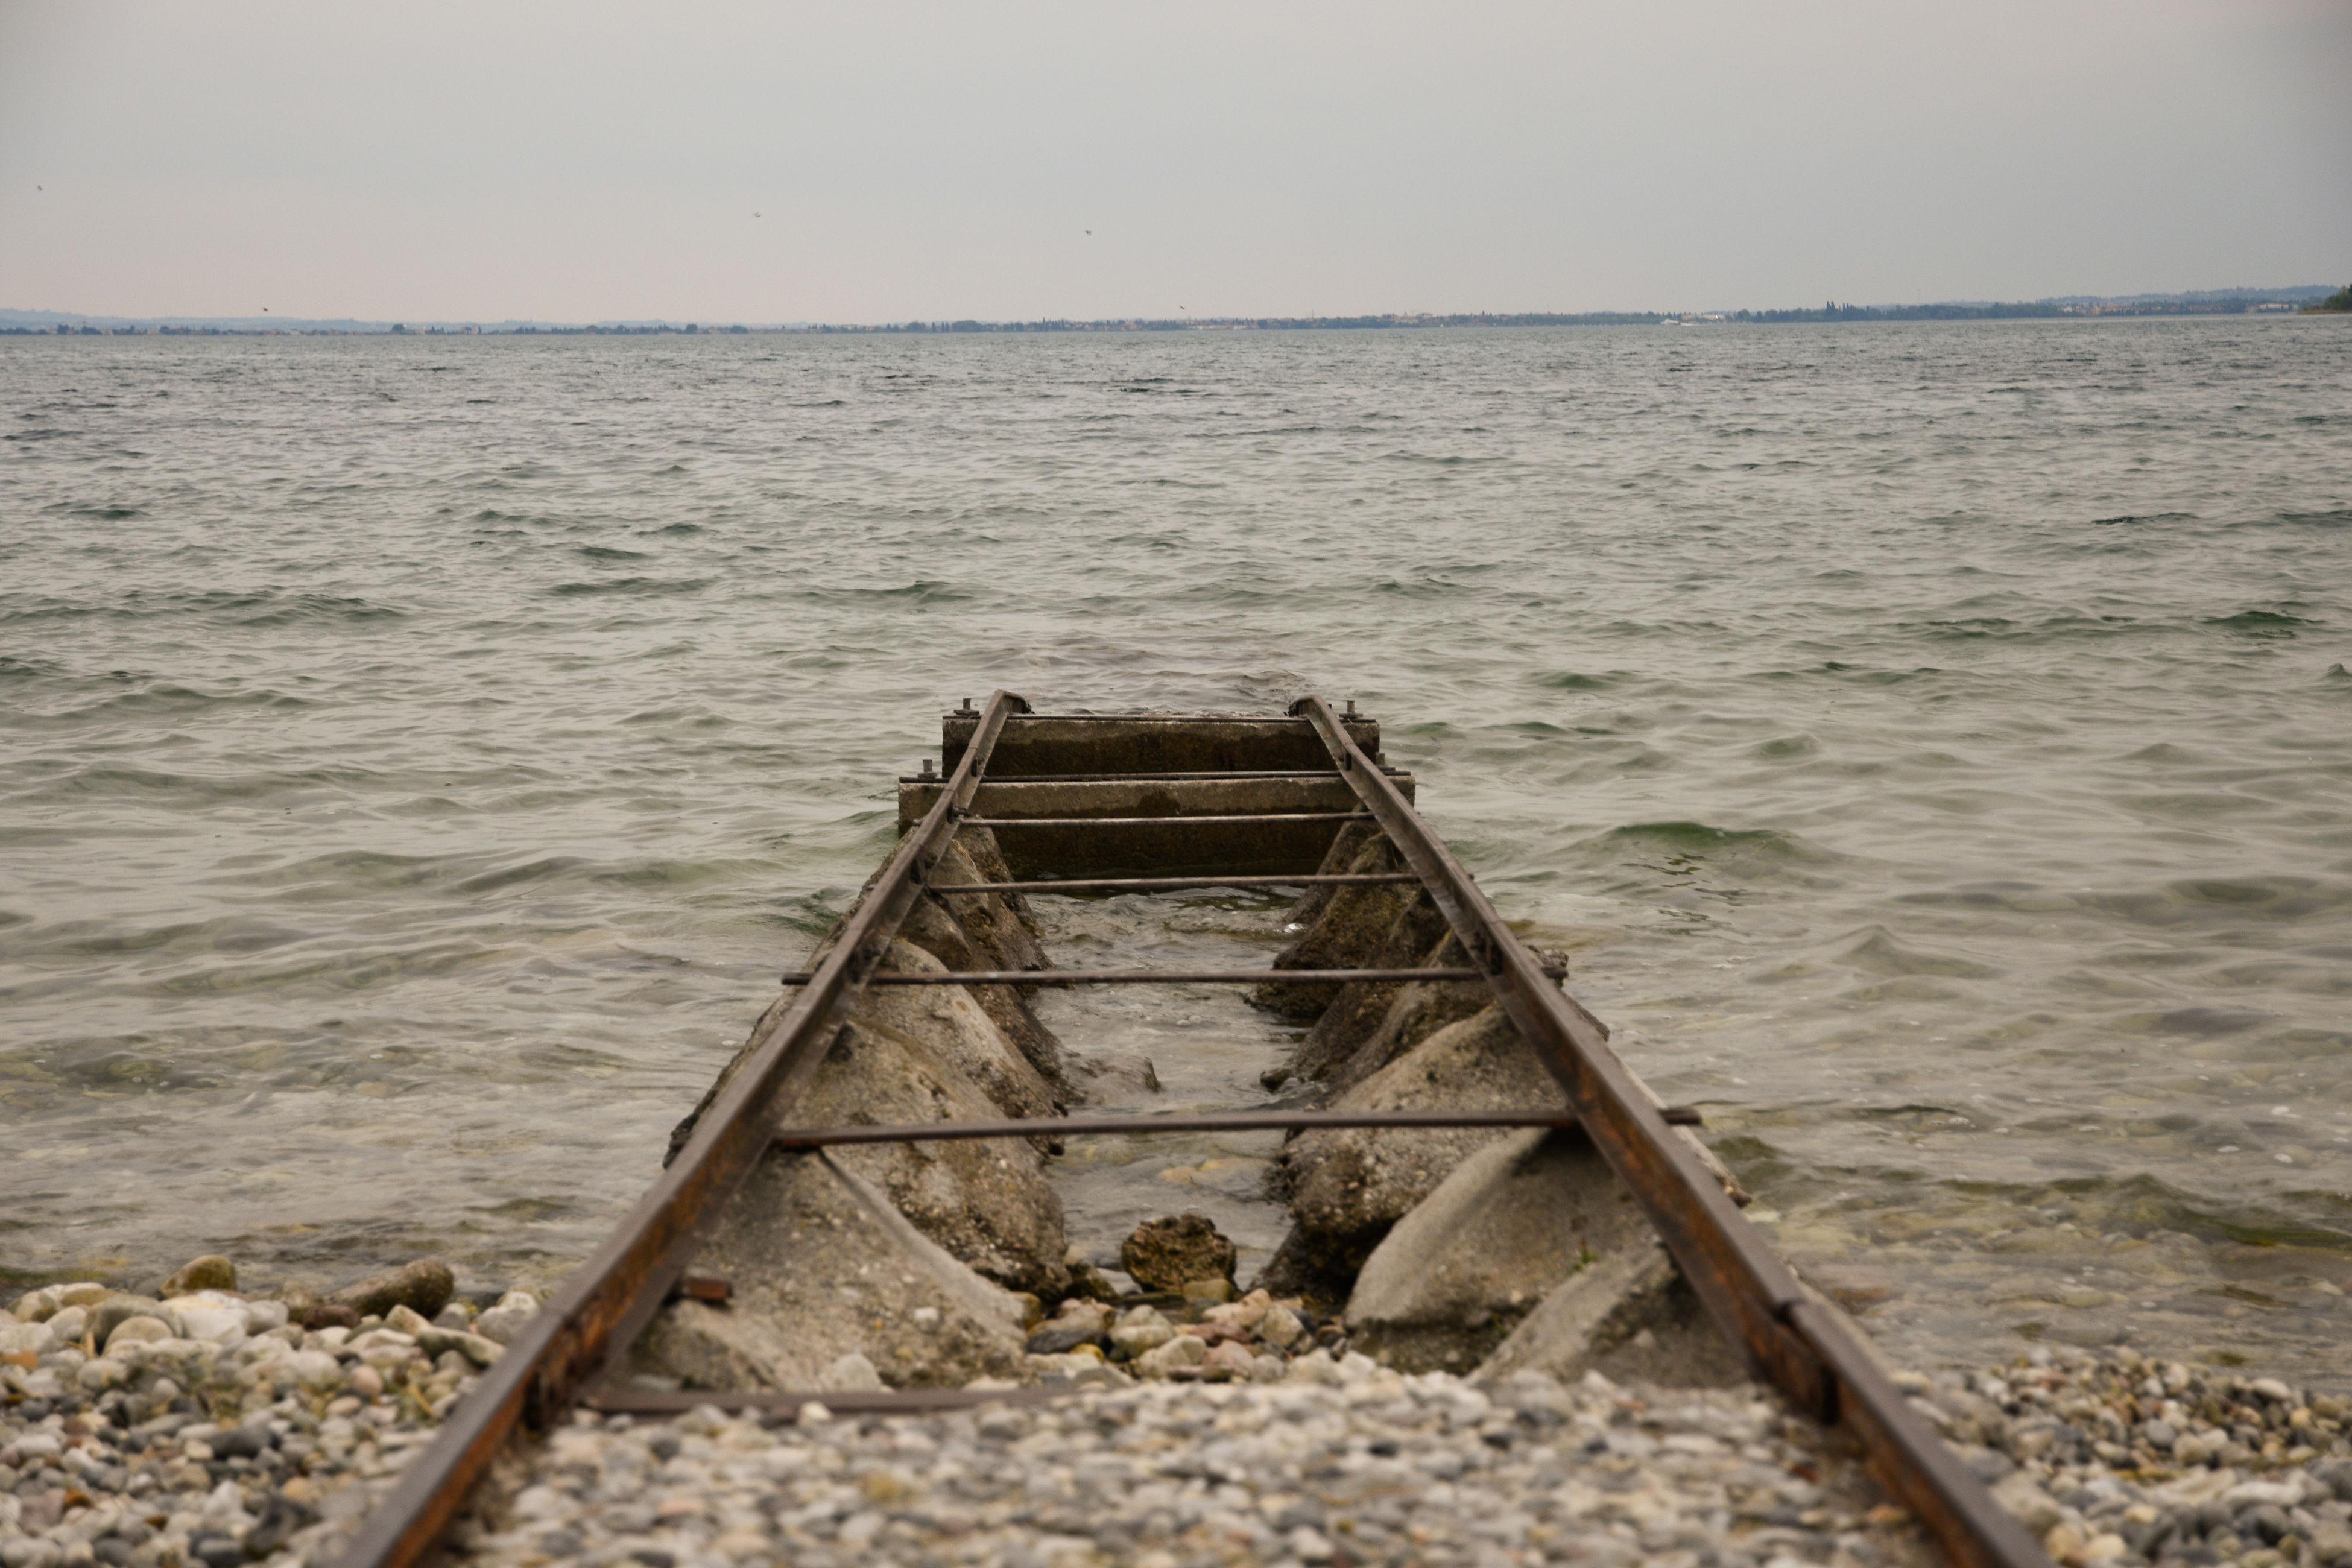 The lake of Garda Feel The Journey Lake Nature Photography Nature Traveling The Lake Of Garda Garda Garda Lake Italy